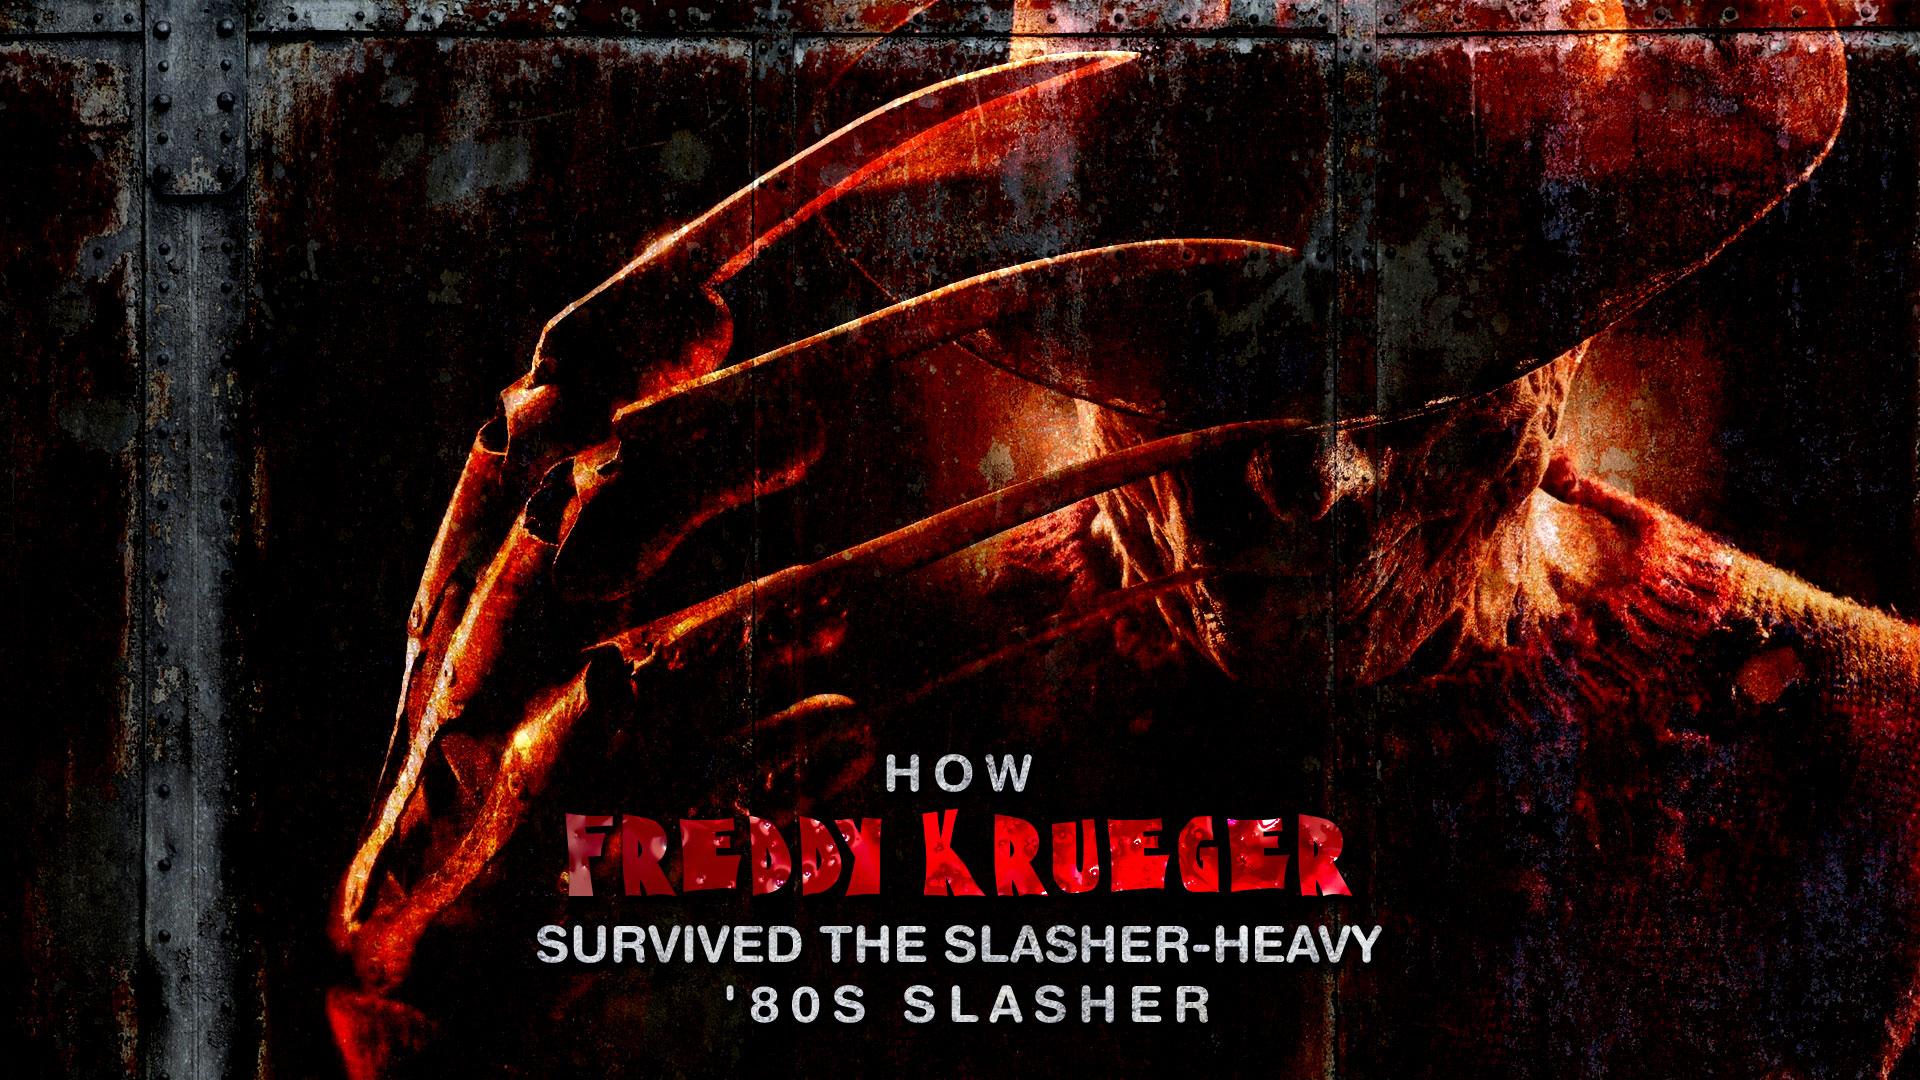 HORRORWOOD™ Presents... 'How Freddy Krueger Survived the Slasher-Heavy '80s Slasher'